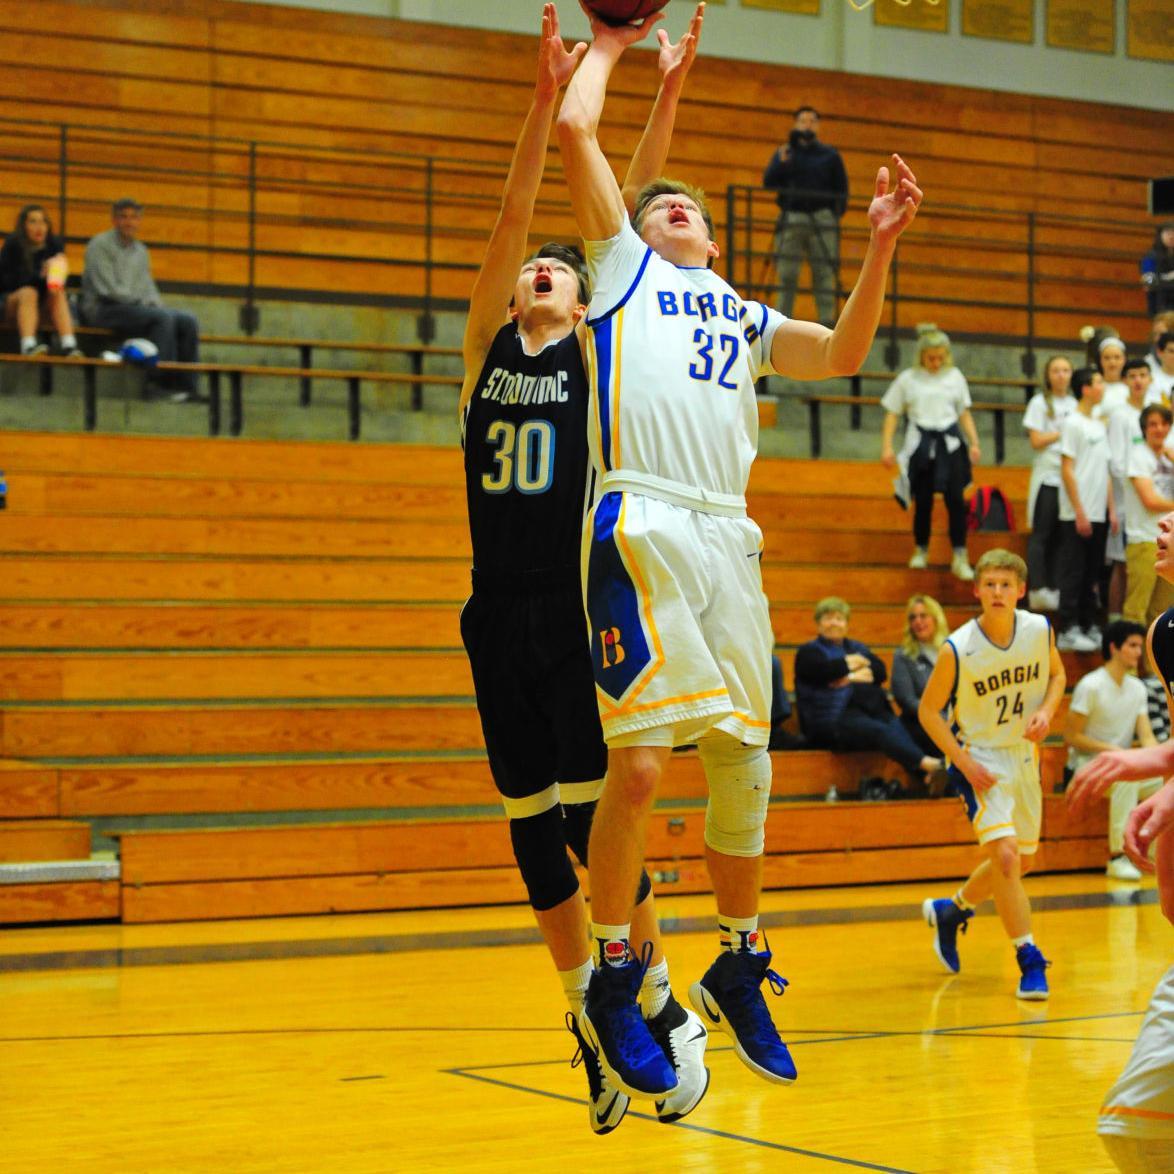 Boys Basketball — Borgia vs. St. Dominic